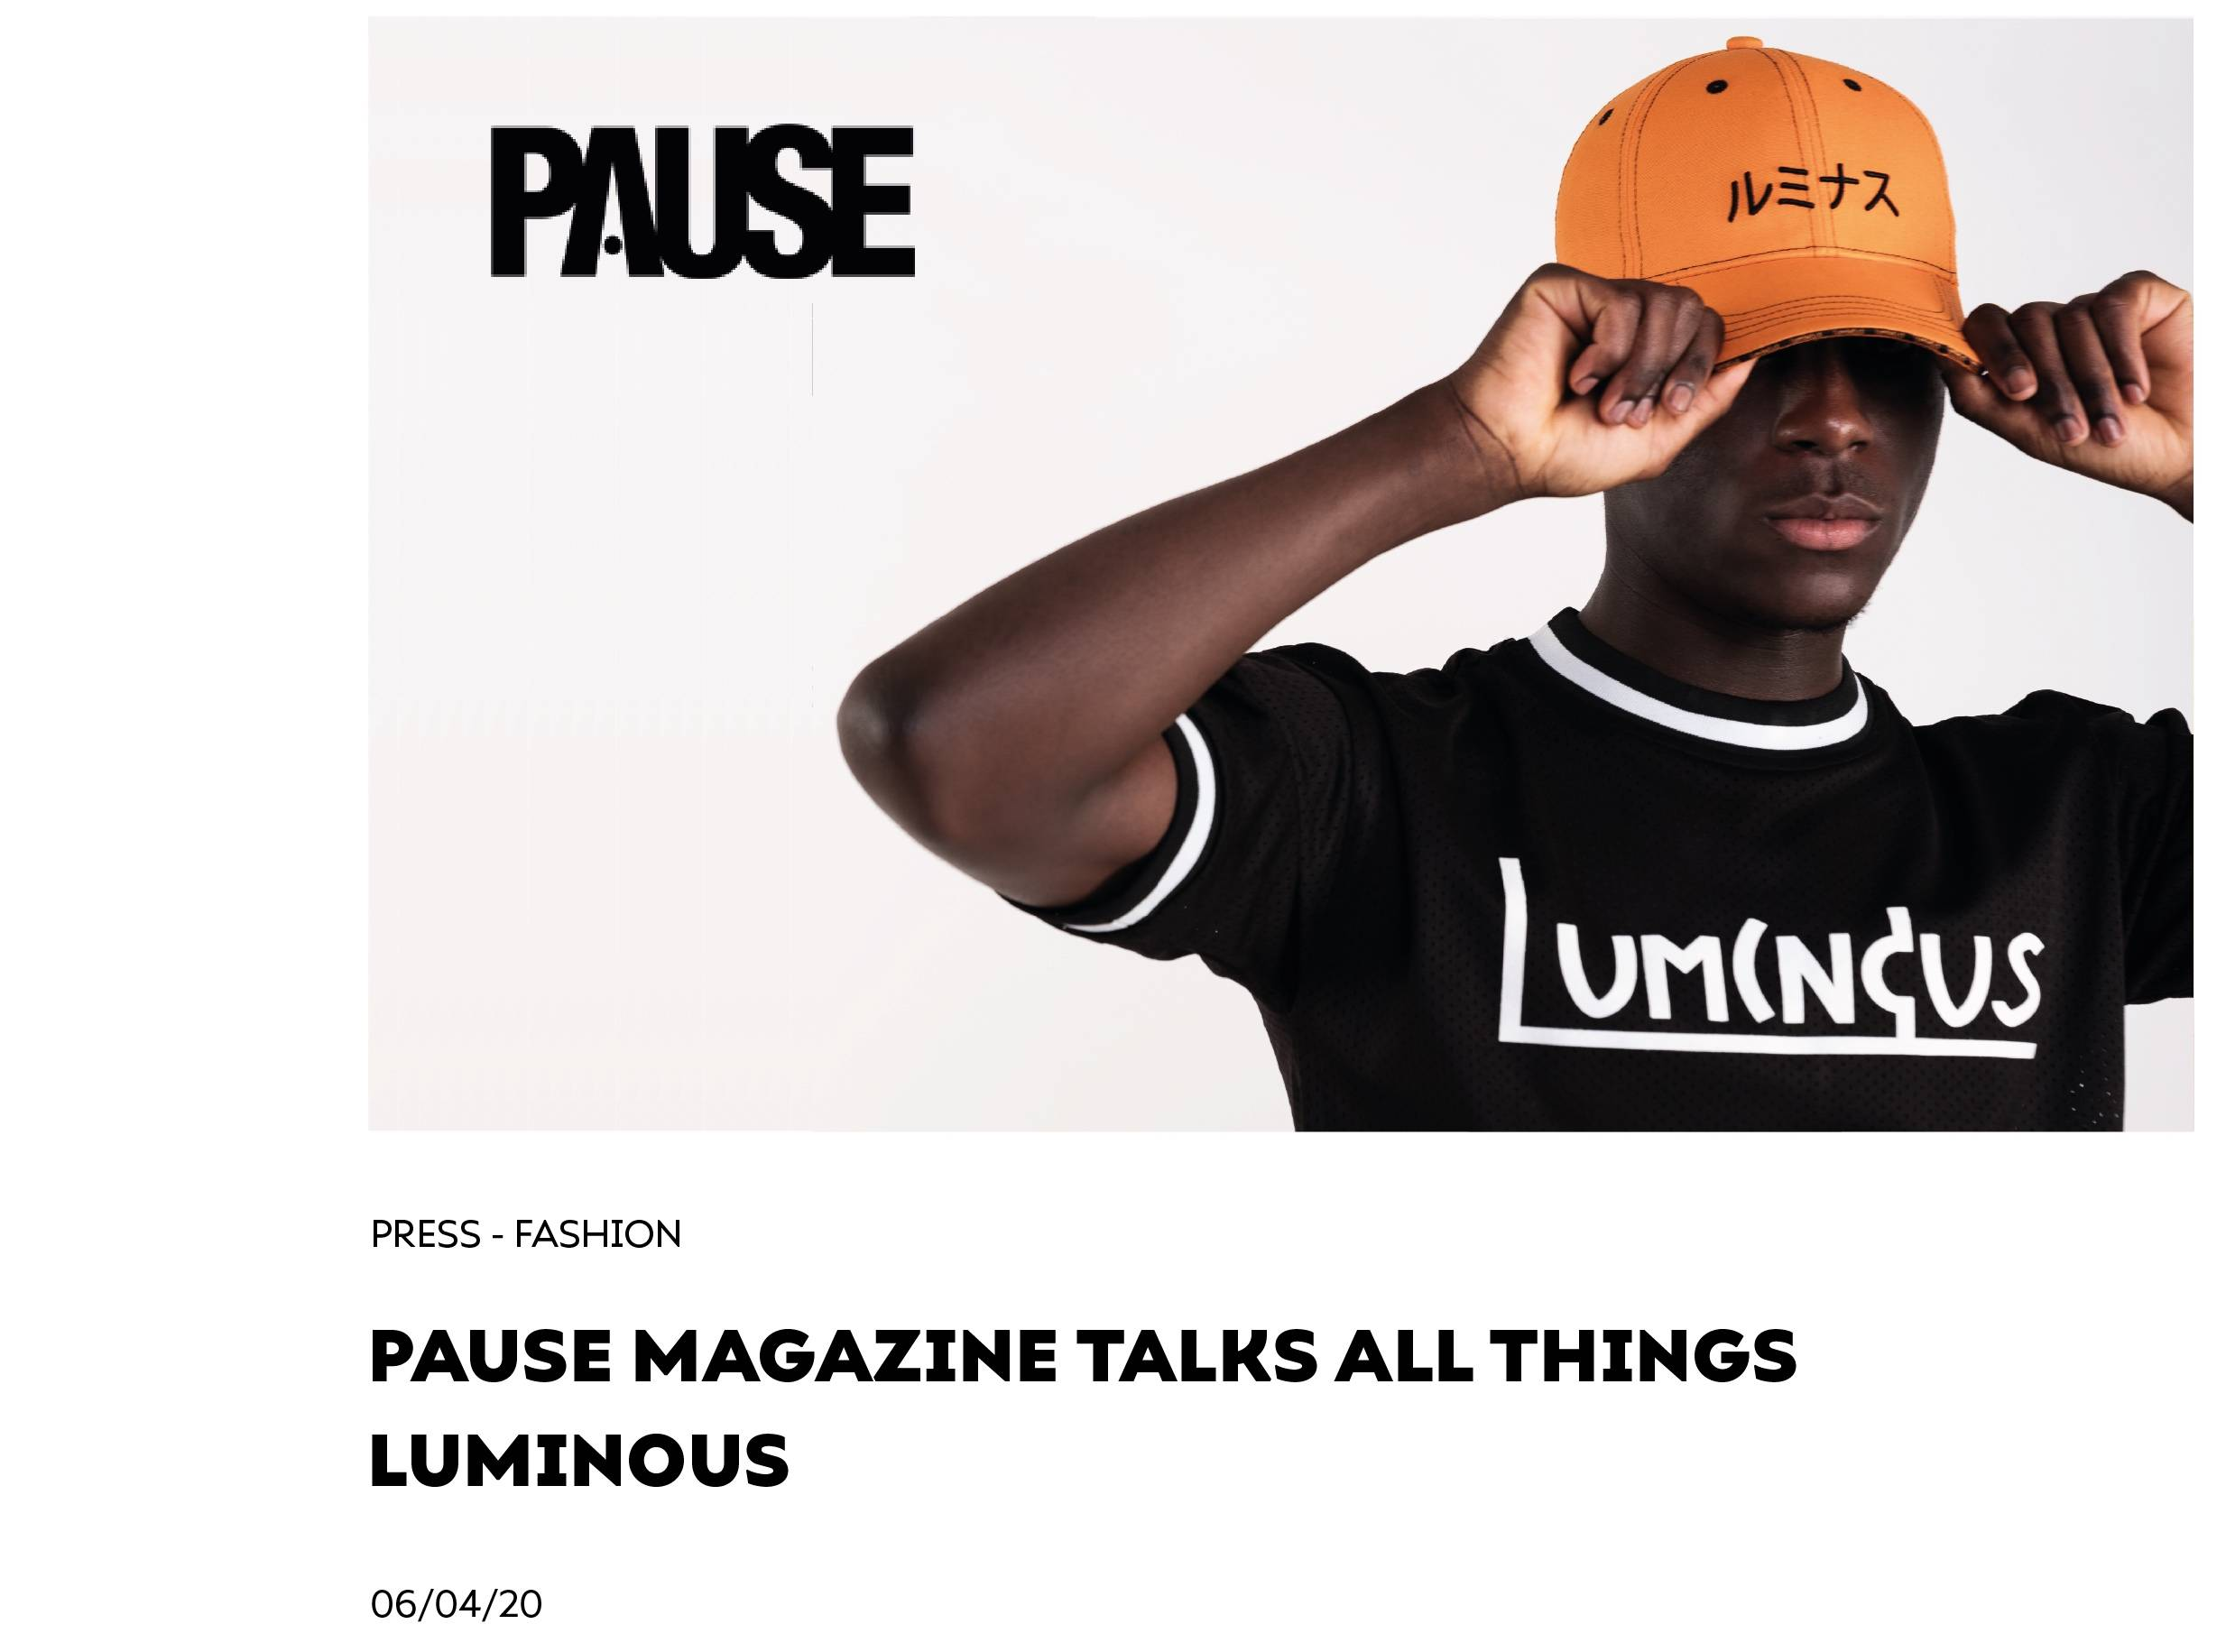 PAUSE Magazine Talks All Things Luminous